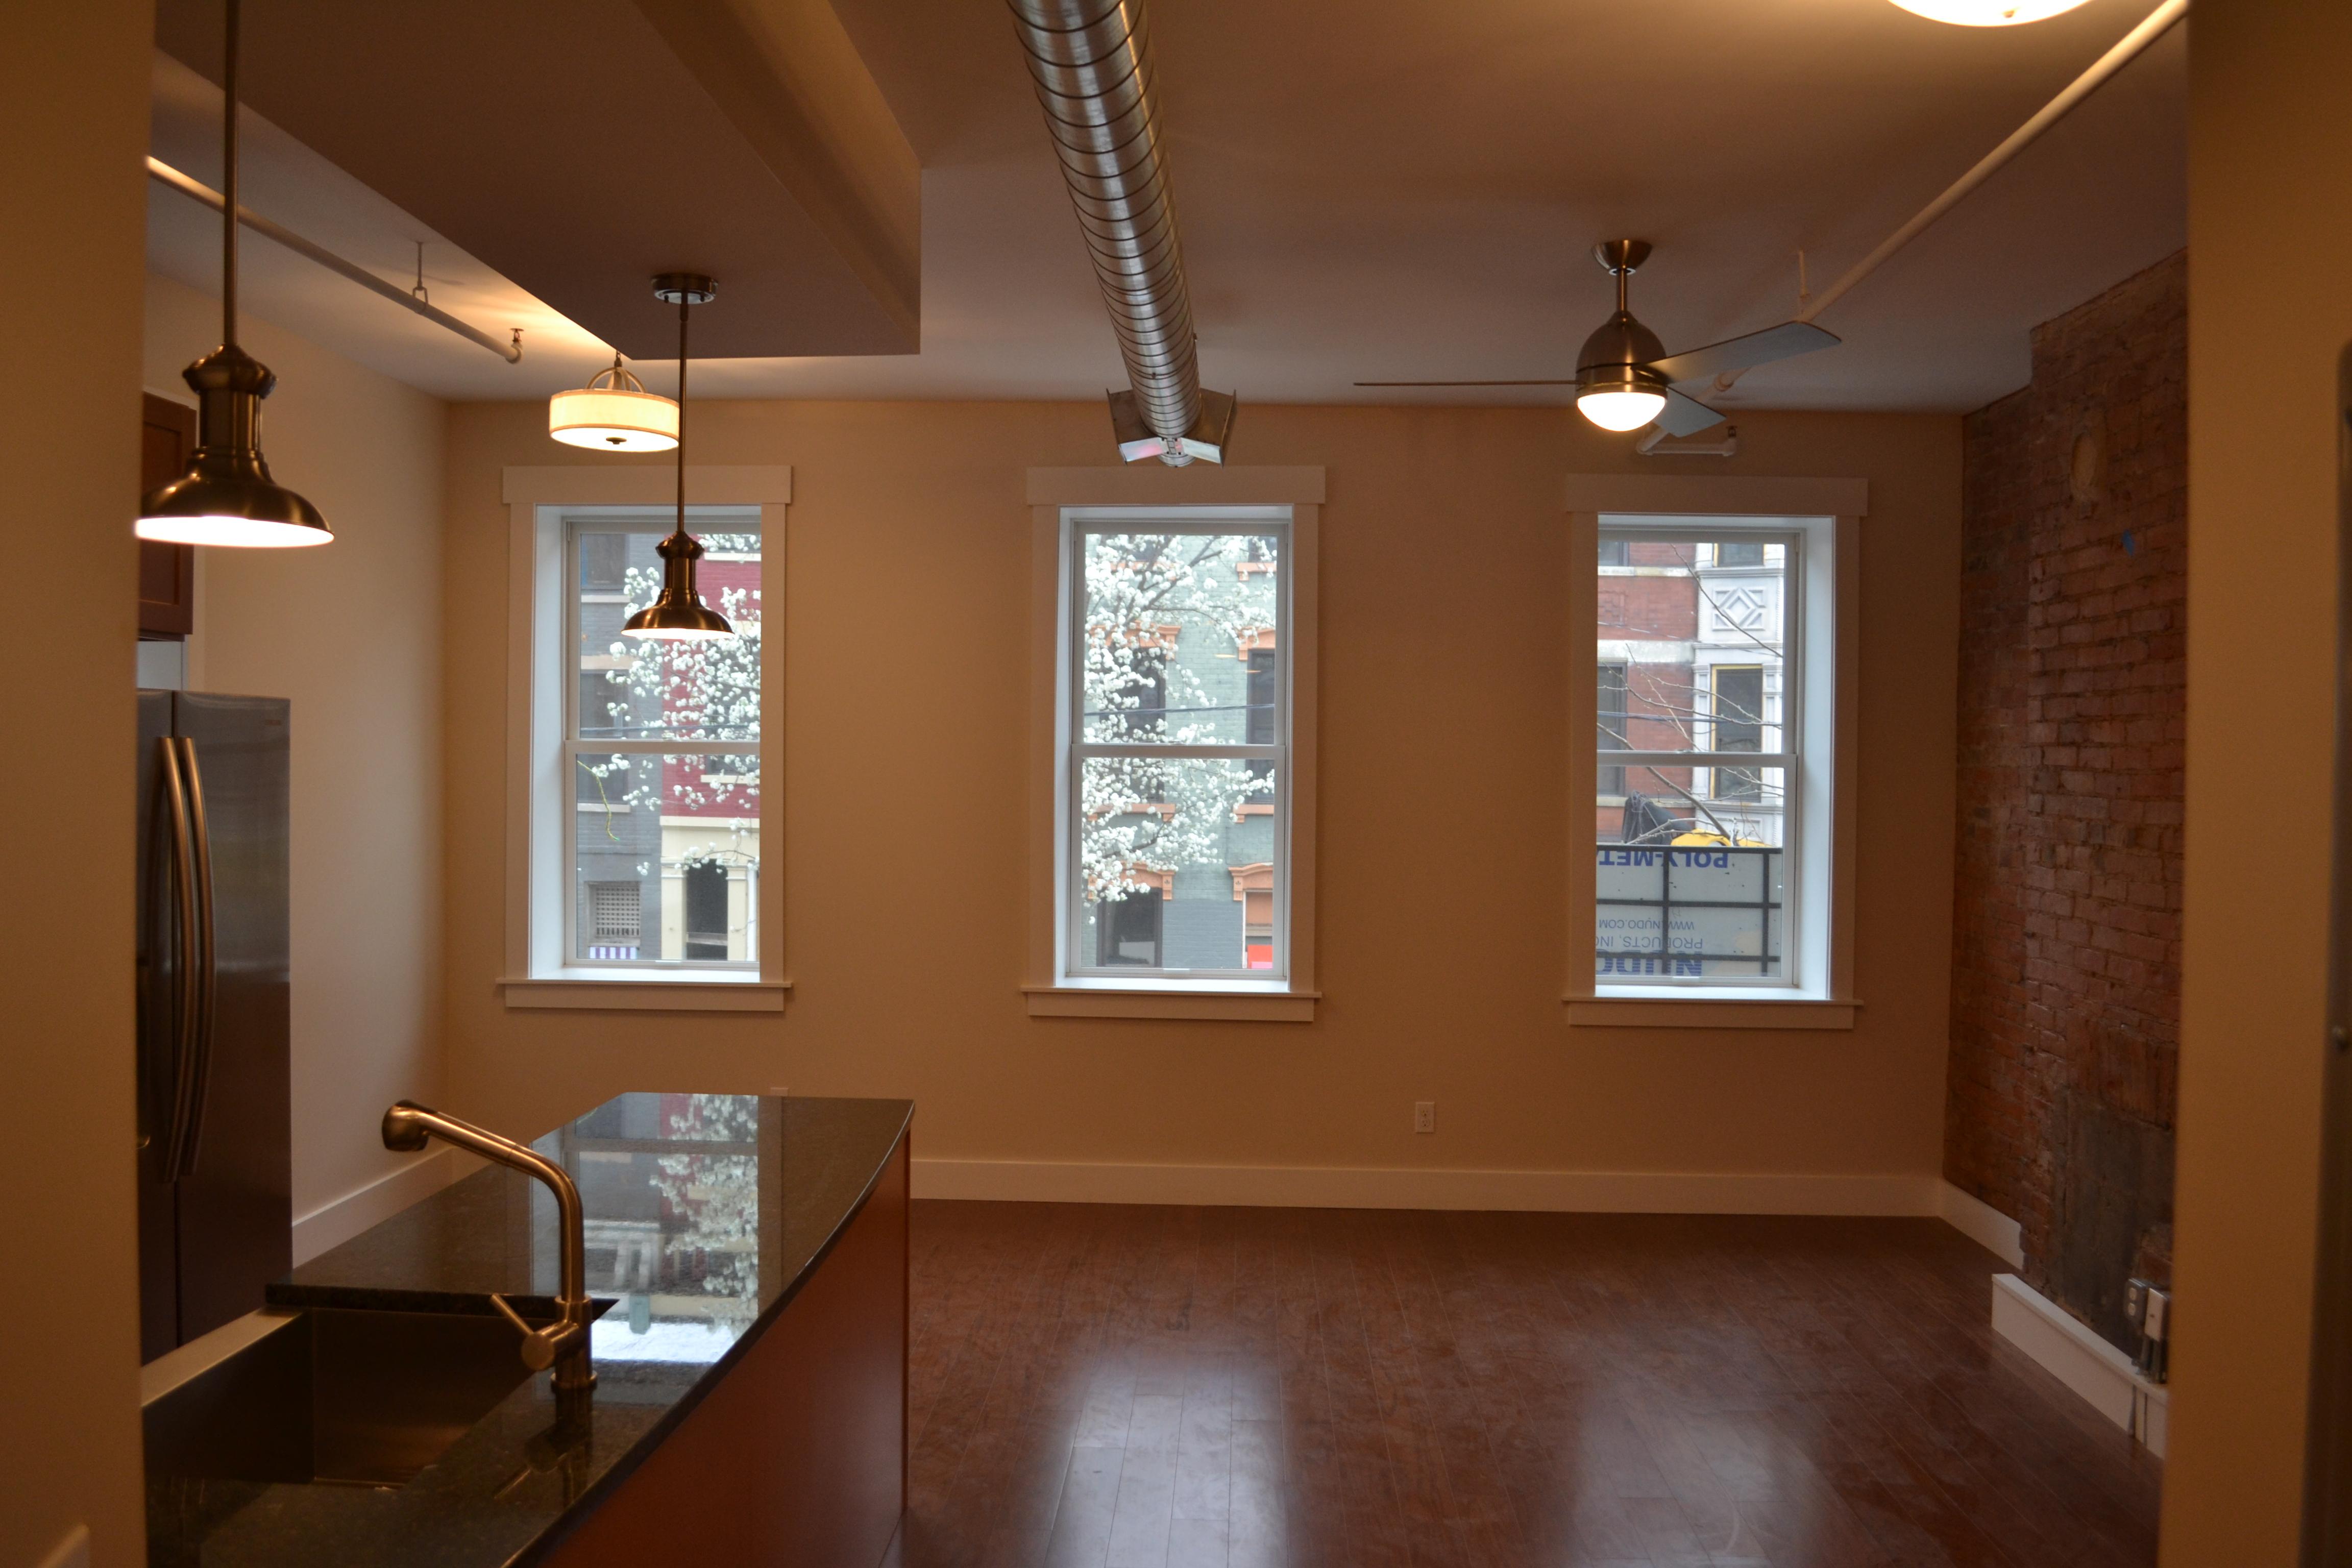 Graybach Bakery Lofts - Open Area 1